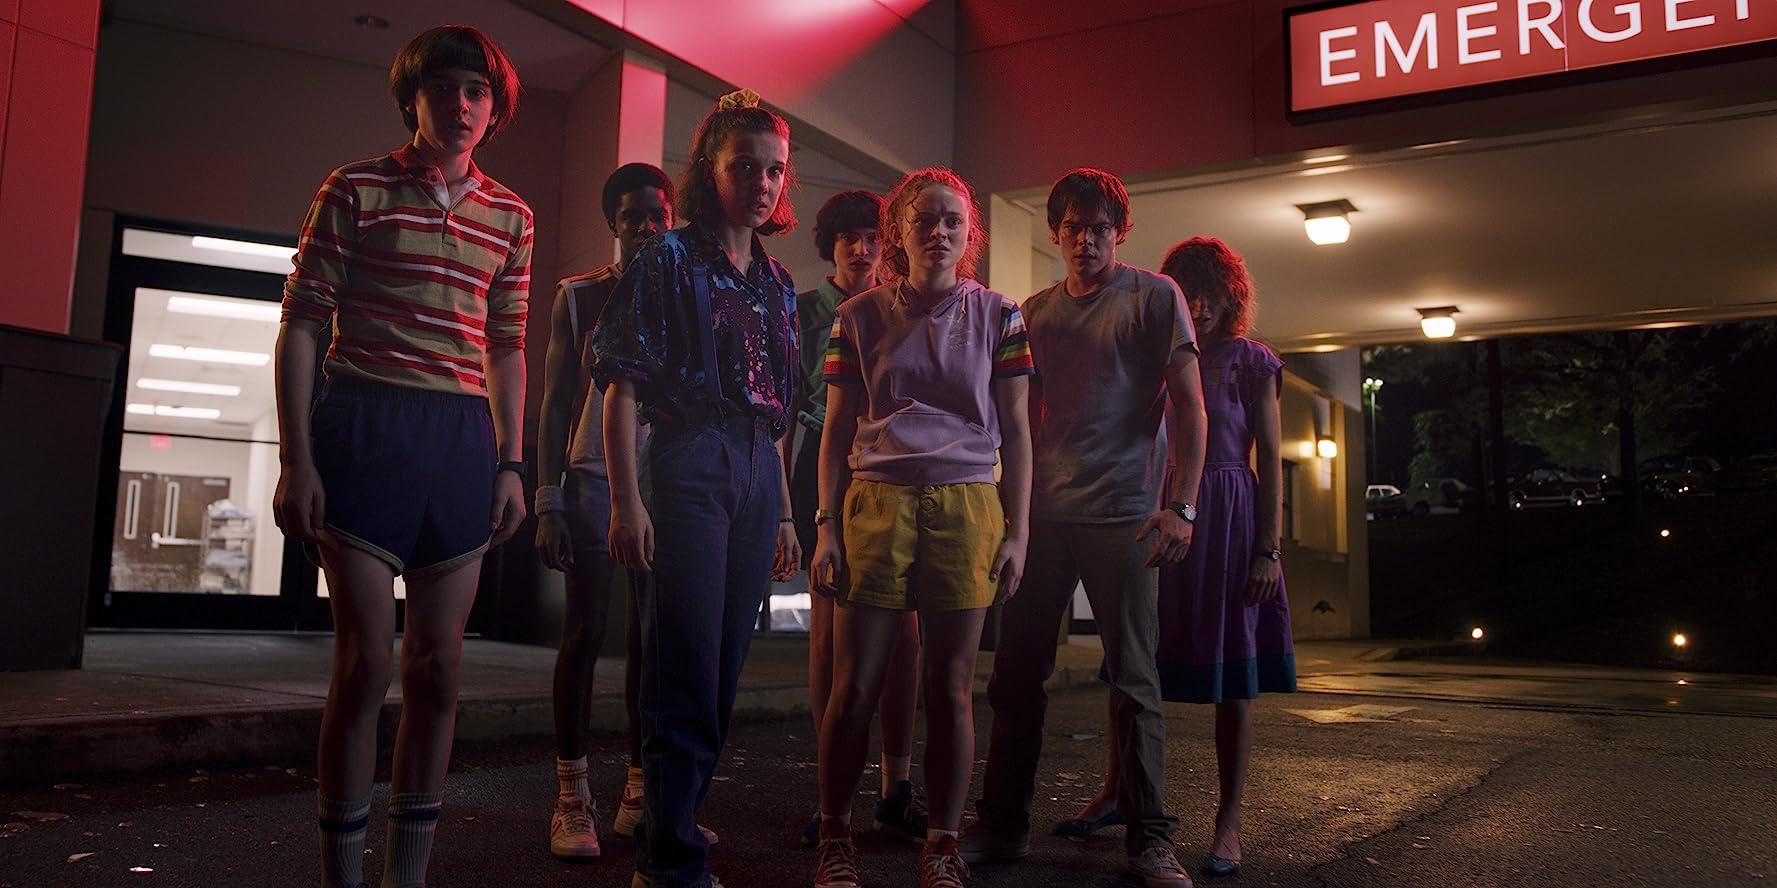 Natalia Dyer, Caleb McLaughlin, Sadie Sink, Millie Bobby Brown, Finn Wolfhard, Charlie Heaton, and Noah Schnapp in Stranger Things (2016)